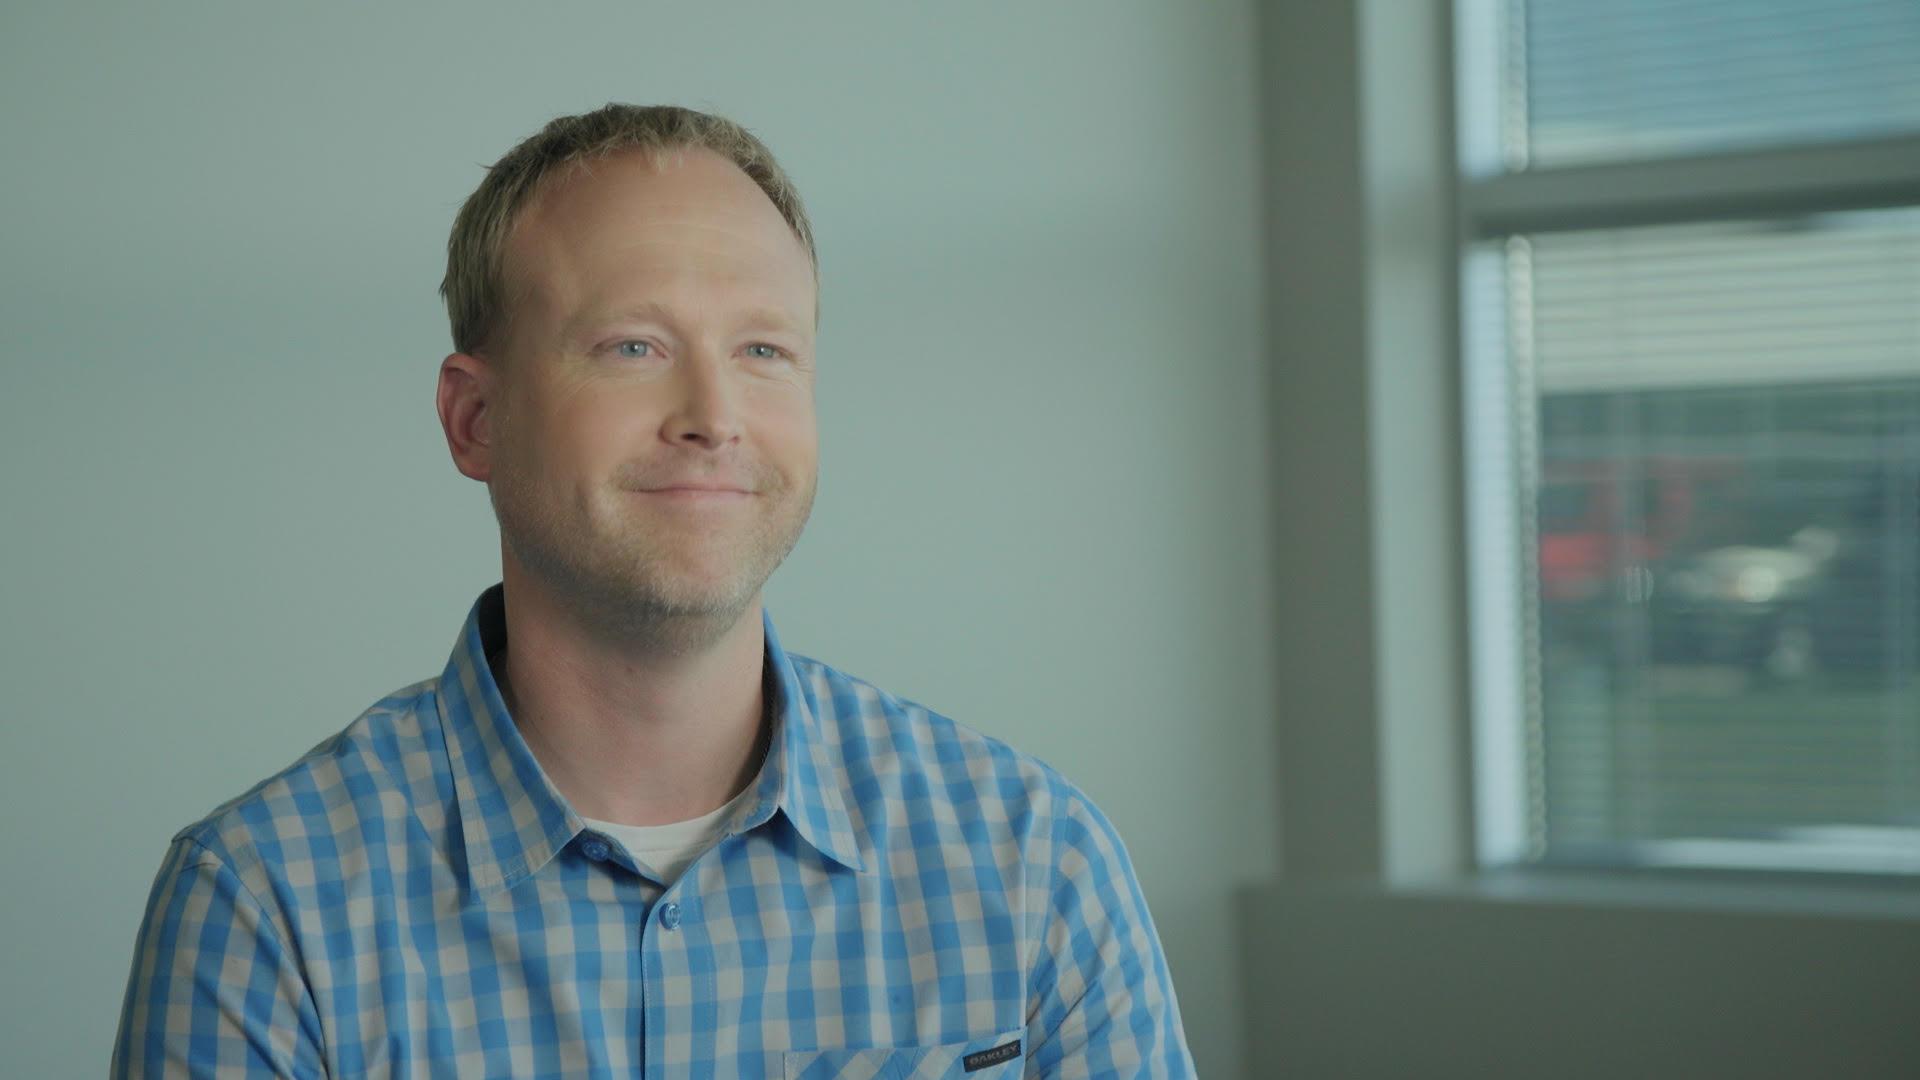 Joe Riesberg, VP of Technology at DHI